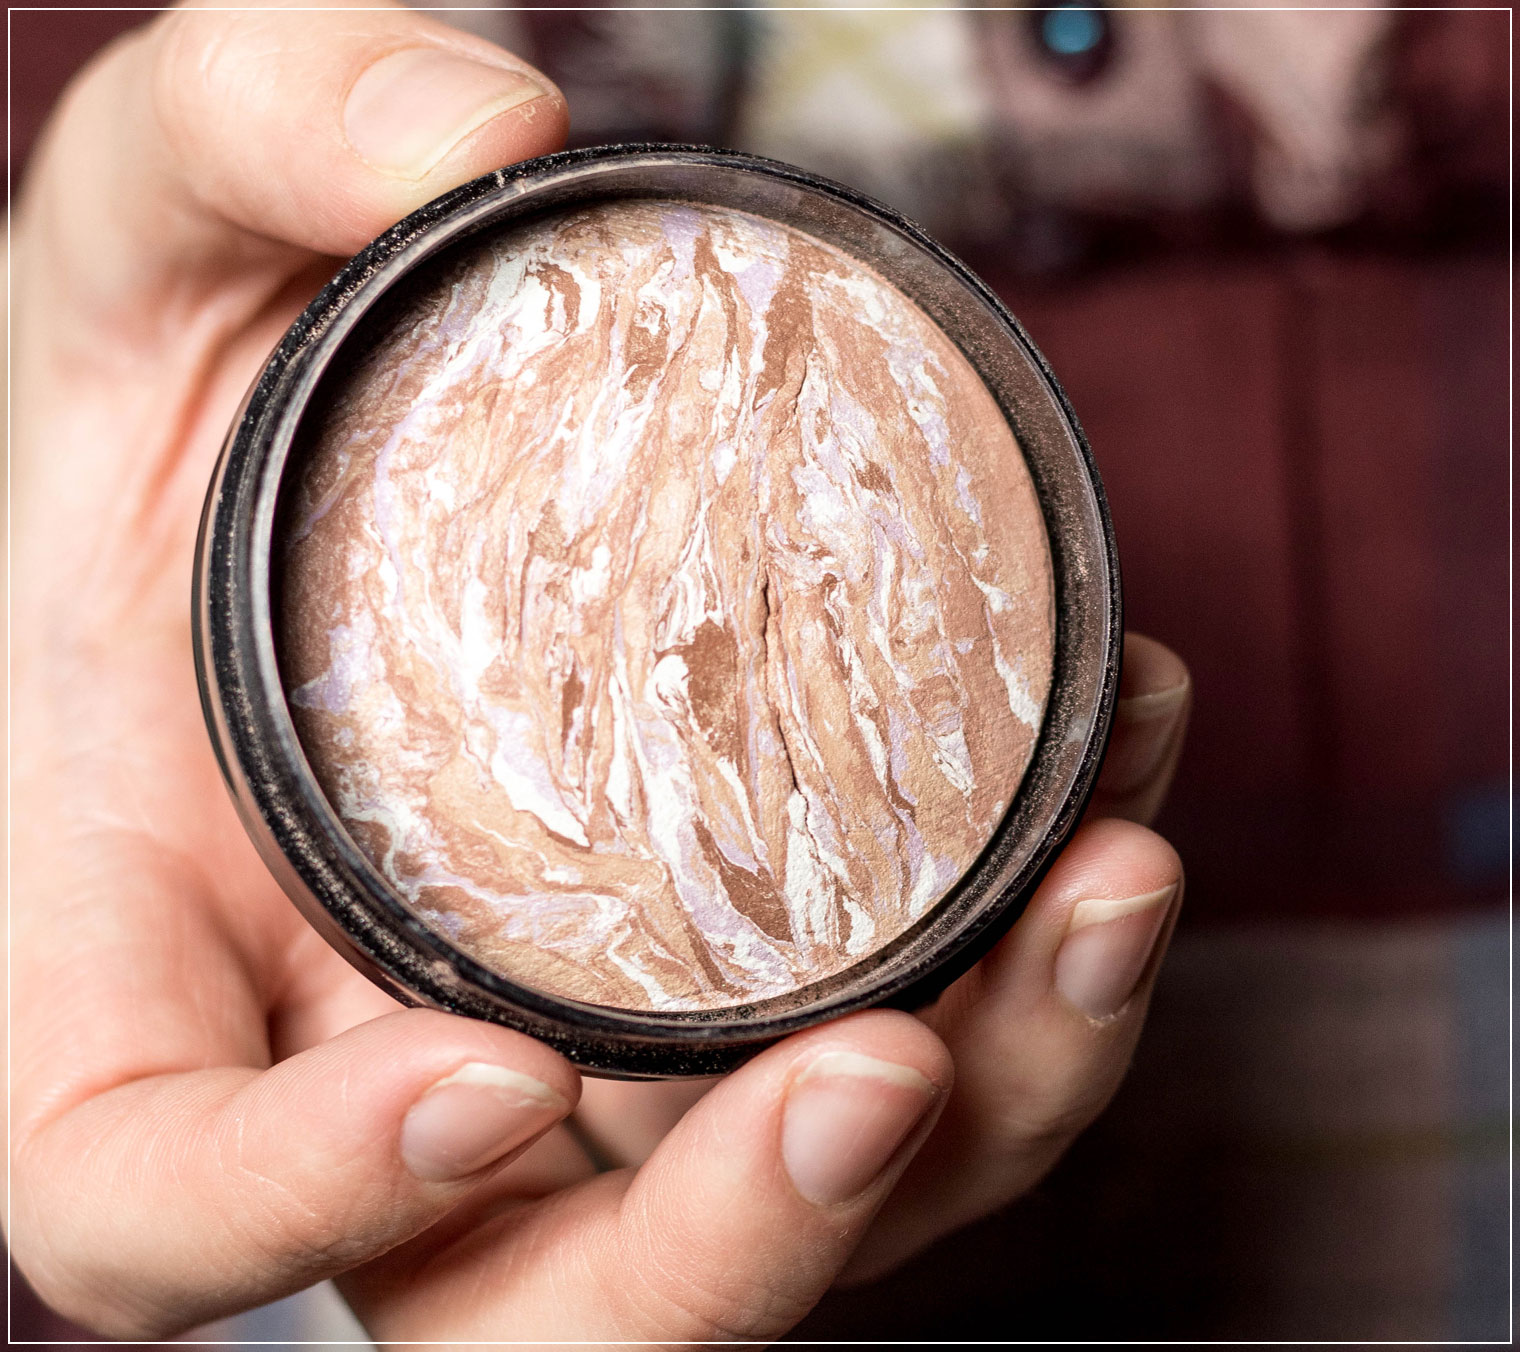 Nude Makeup, dezentes Make-up, Tagesmake-up, Make-up Tutorial, Beauty Blog, Beautybloggerin, Ruhrgebiet